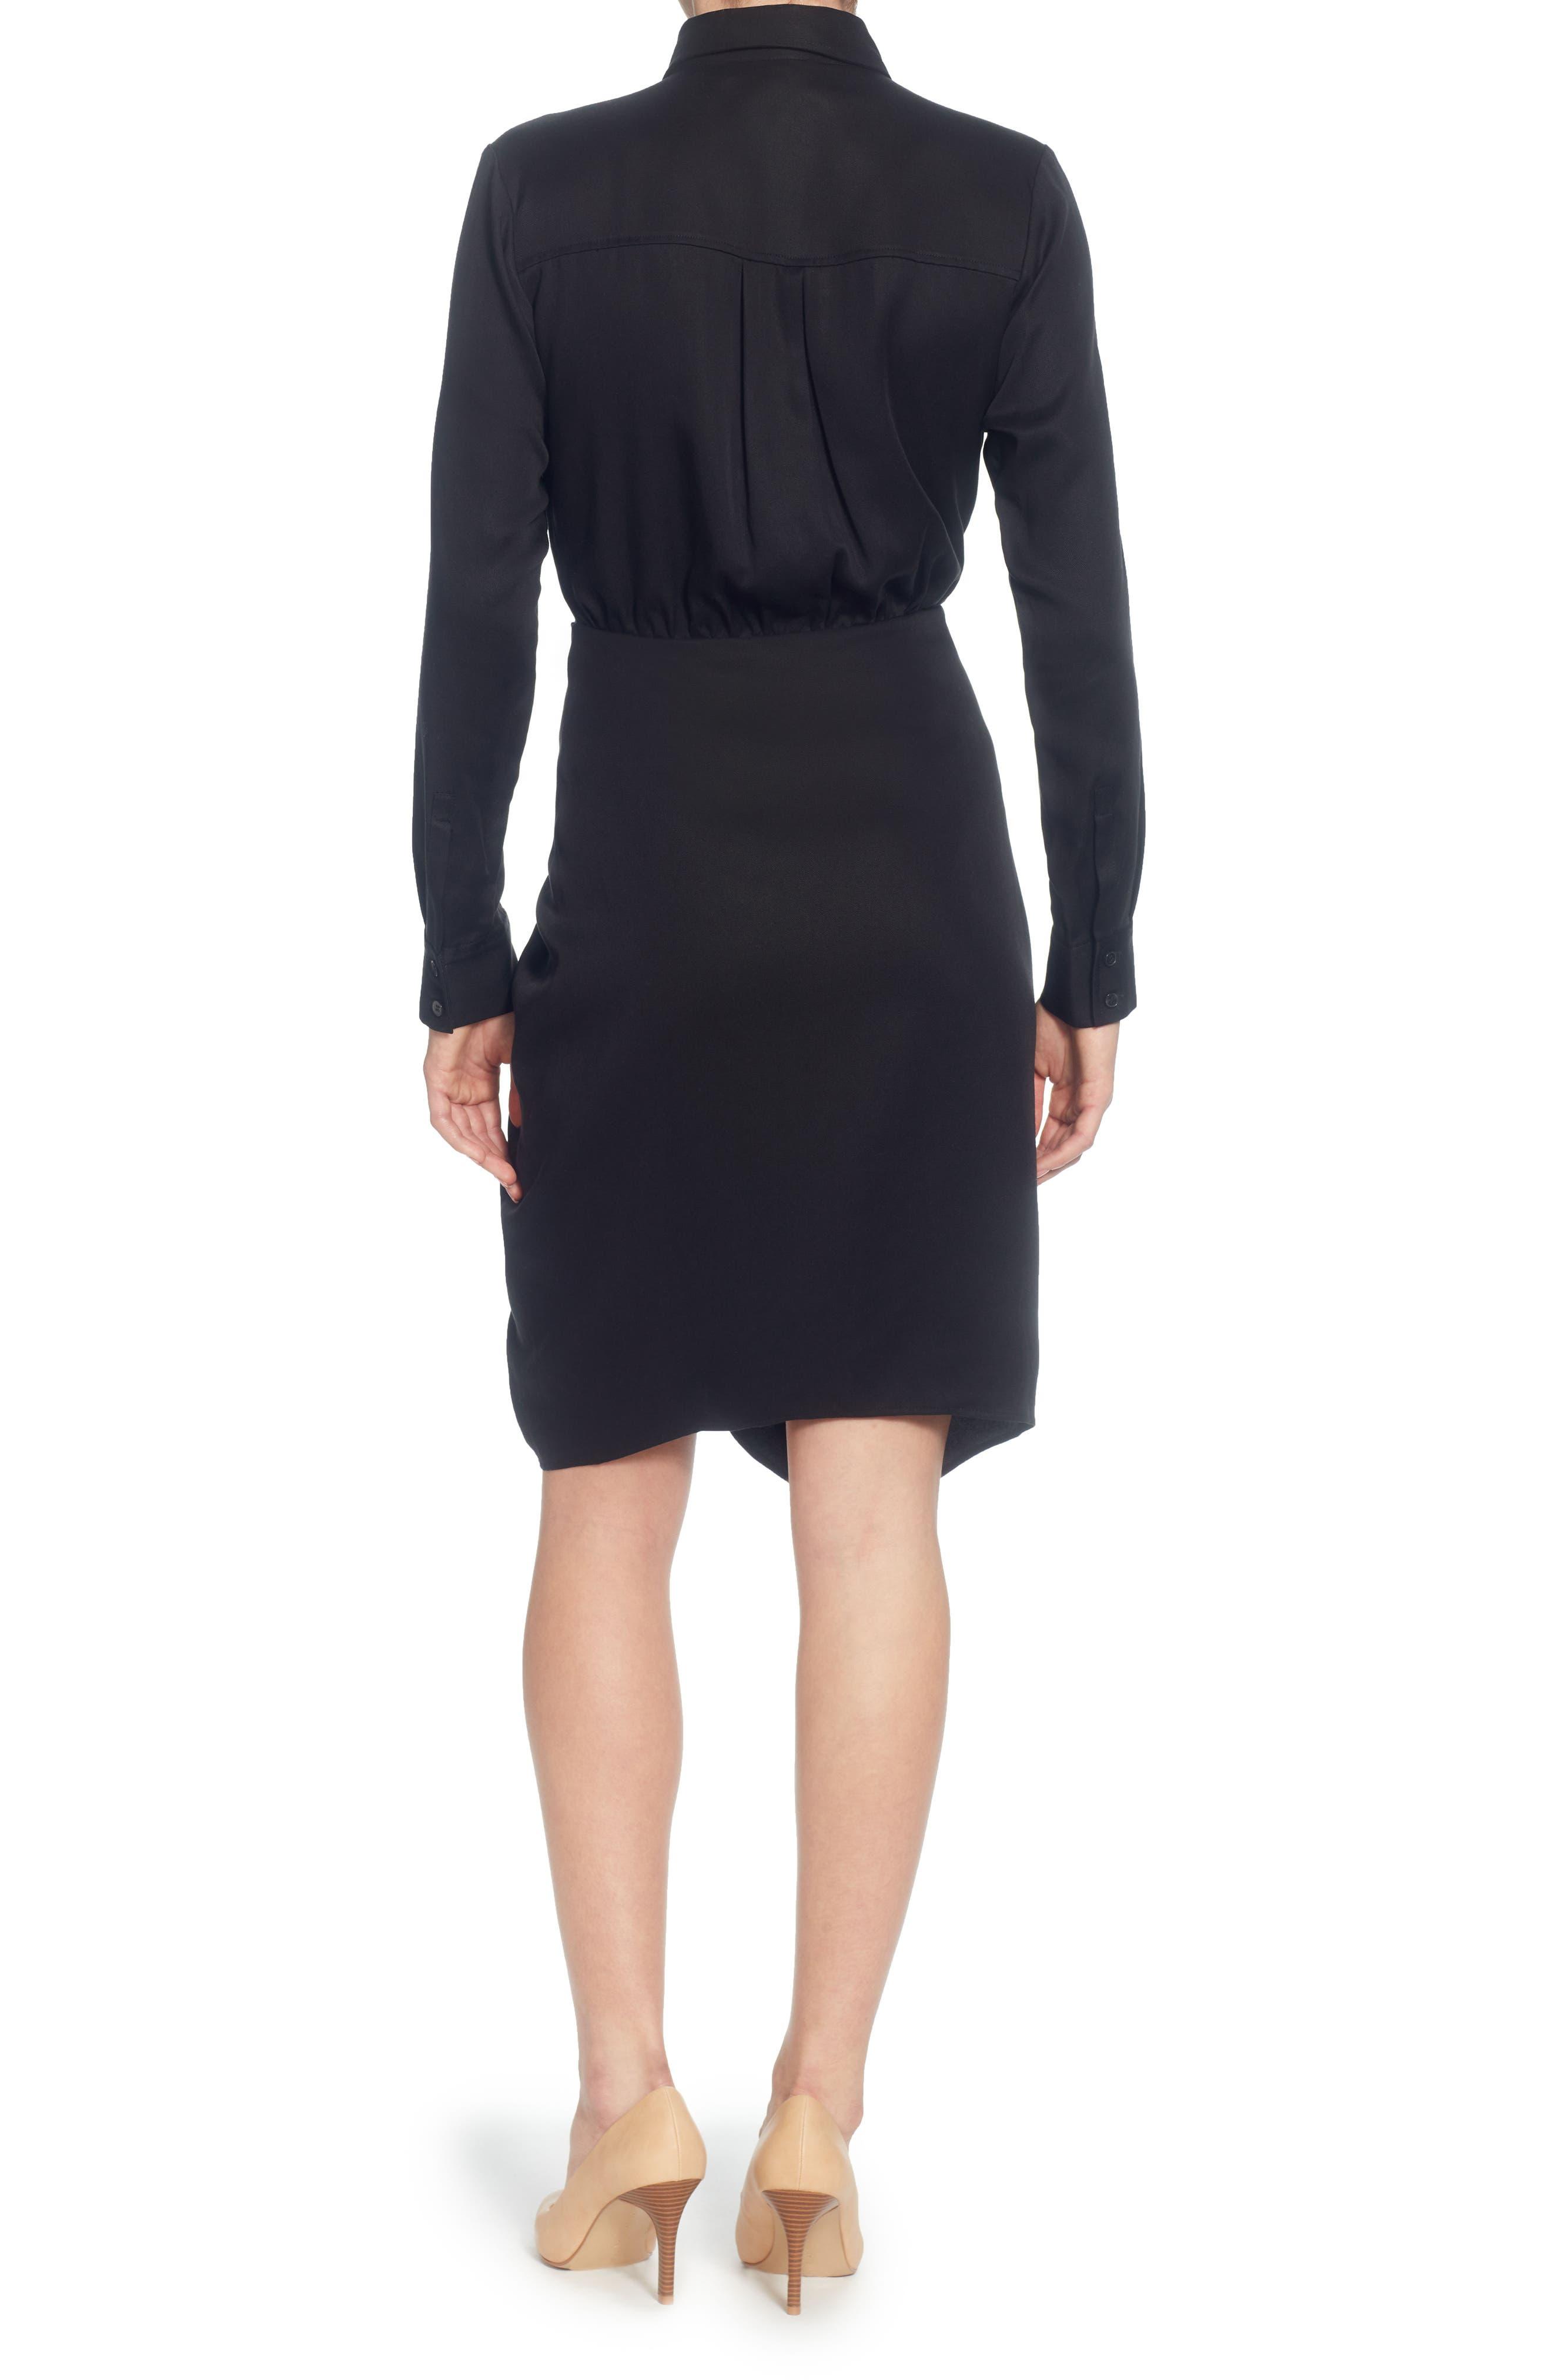 Sloan Tie-Waist Dress,                             Alternate thumbnail 2, color,                             001